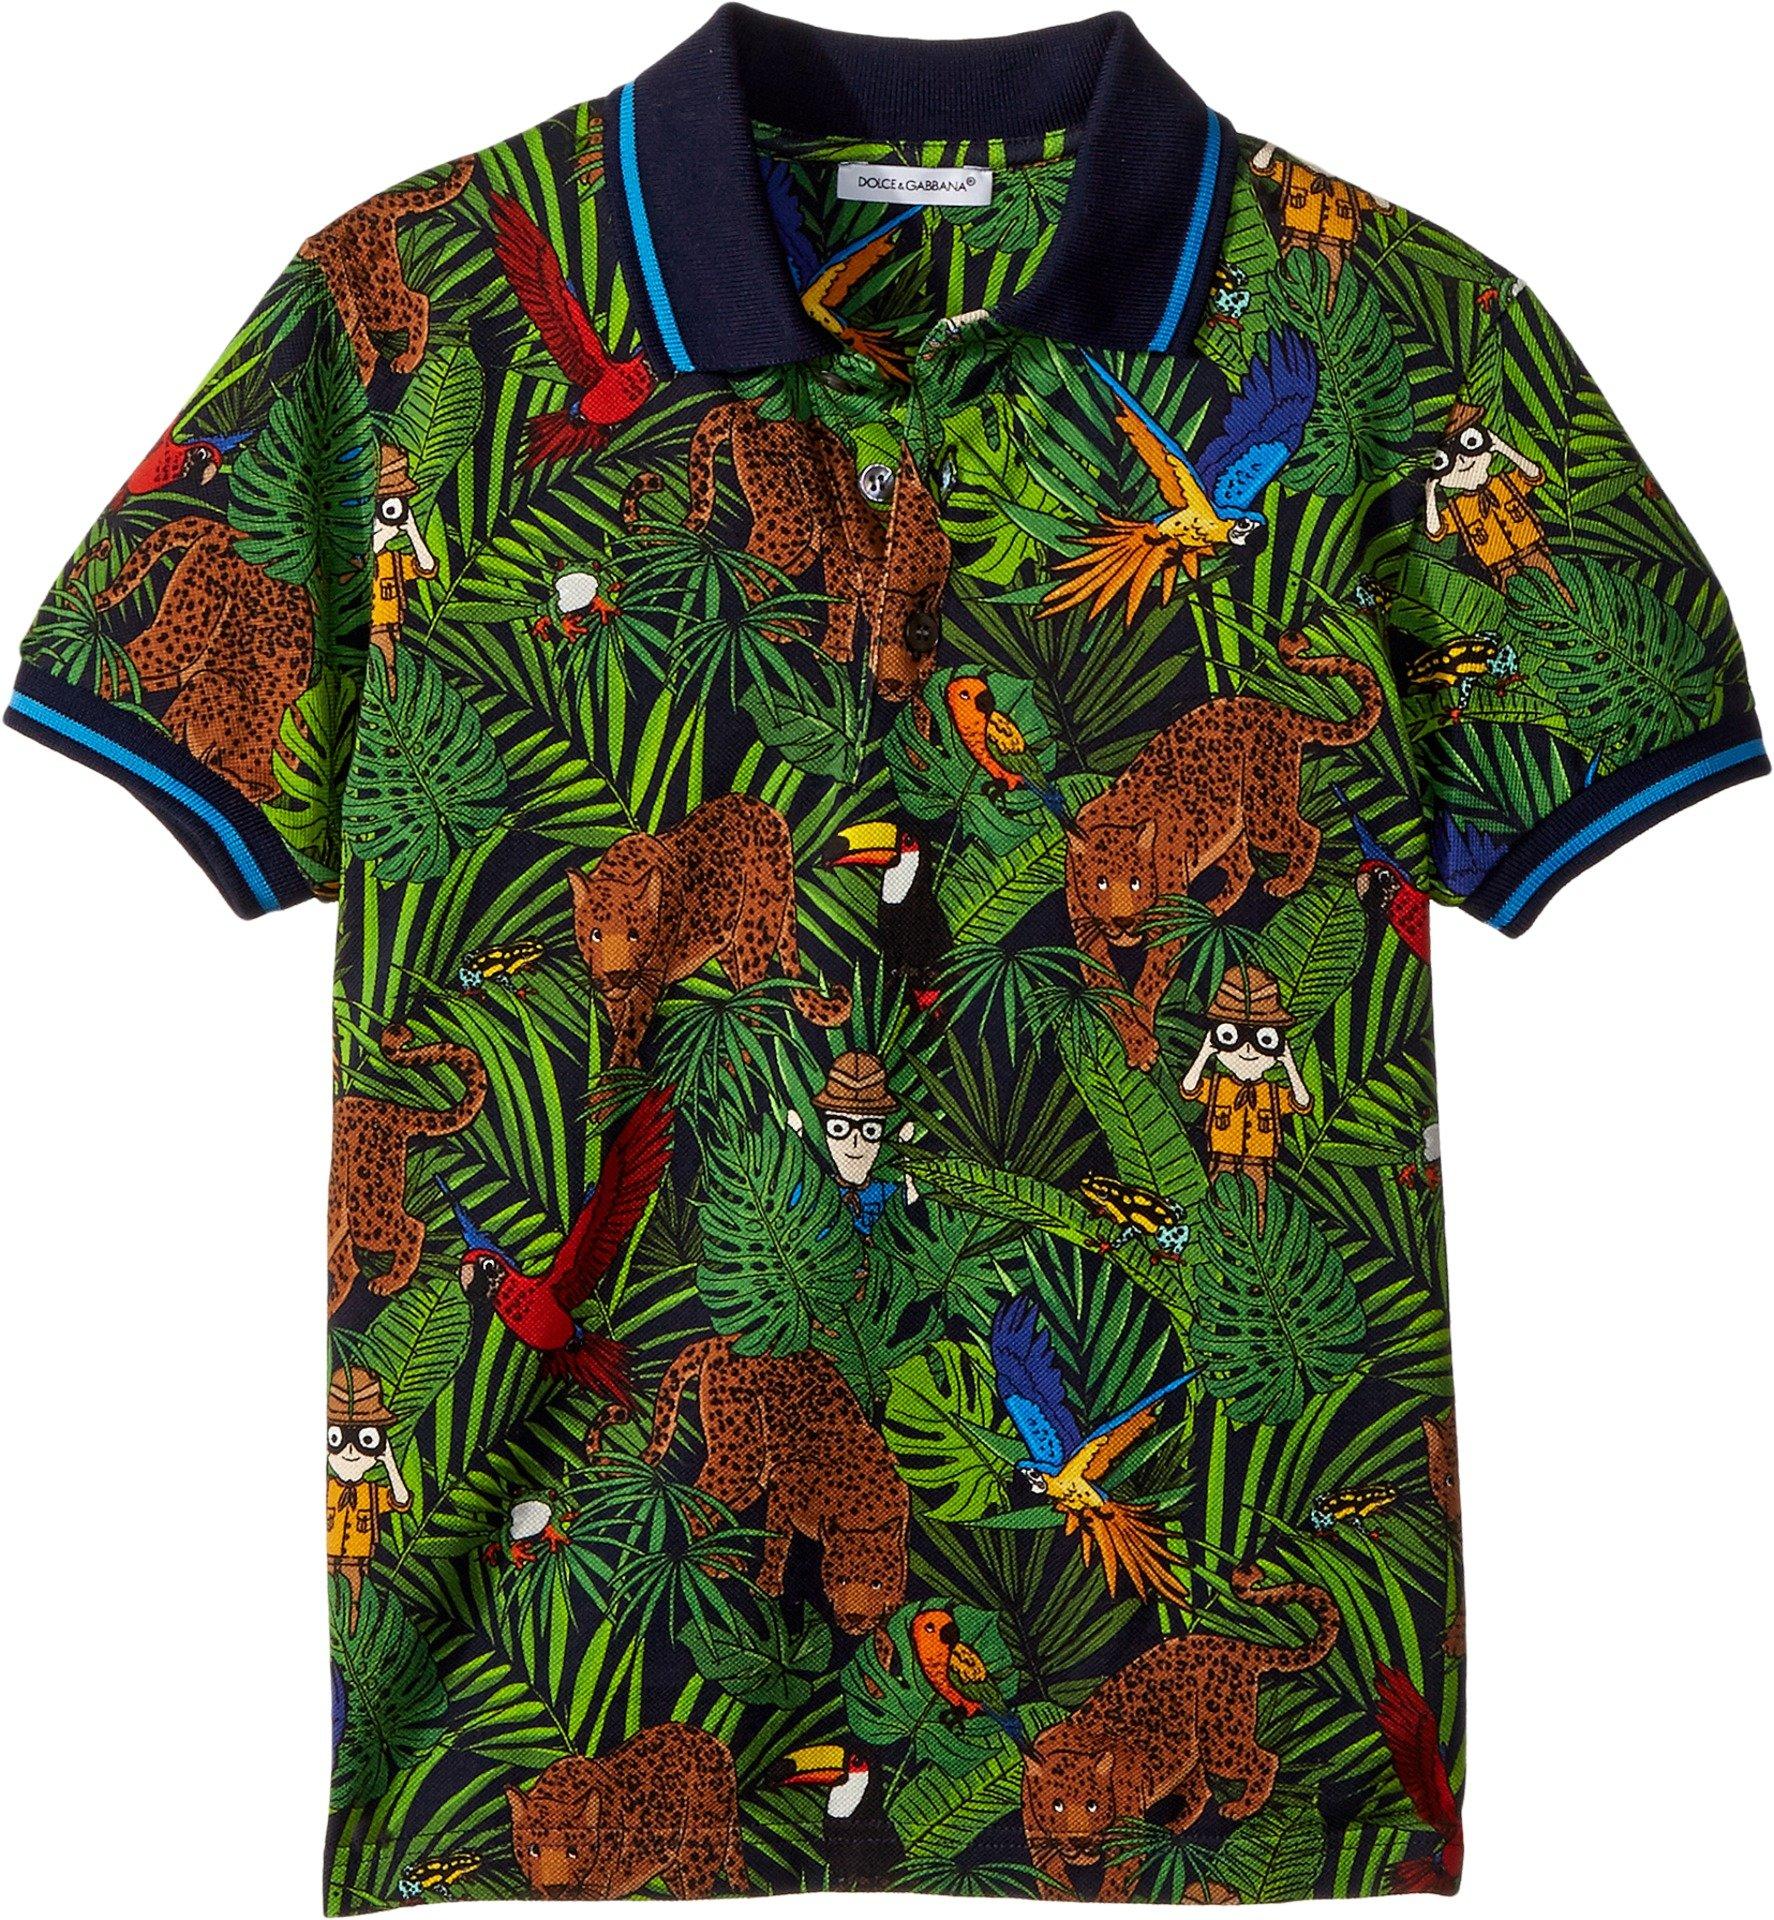 Dolce & Gabbana Kids Baby Boy's Short Sleeve Polo Shirt (Toddler/Little Kids) Blue Print 4 US Little Kid